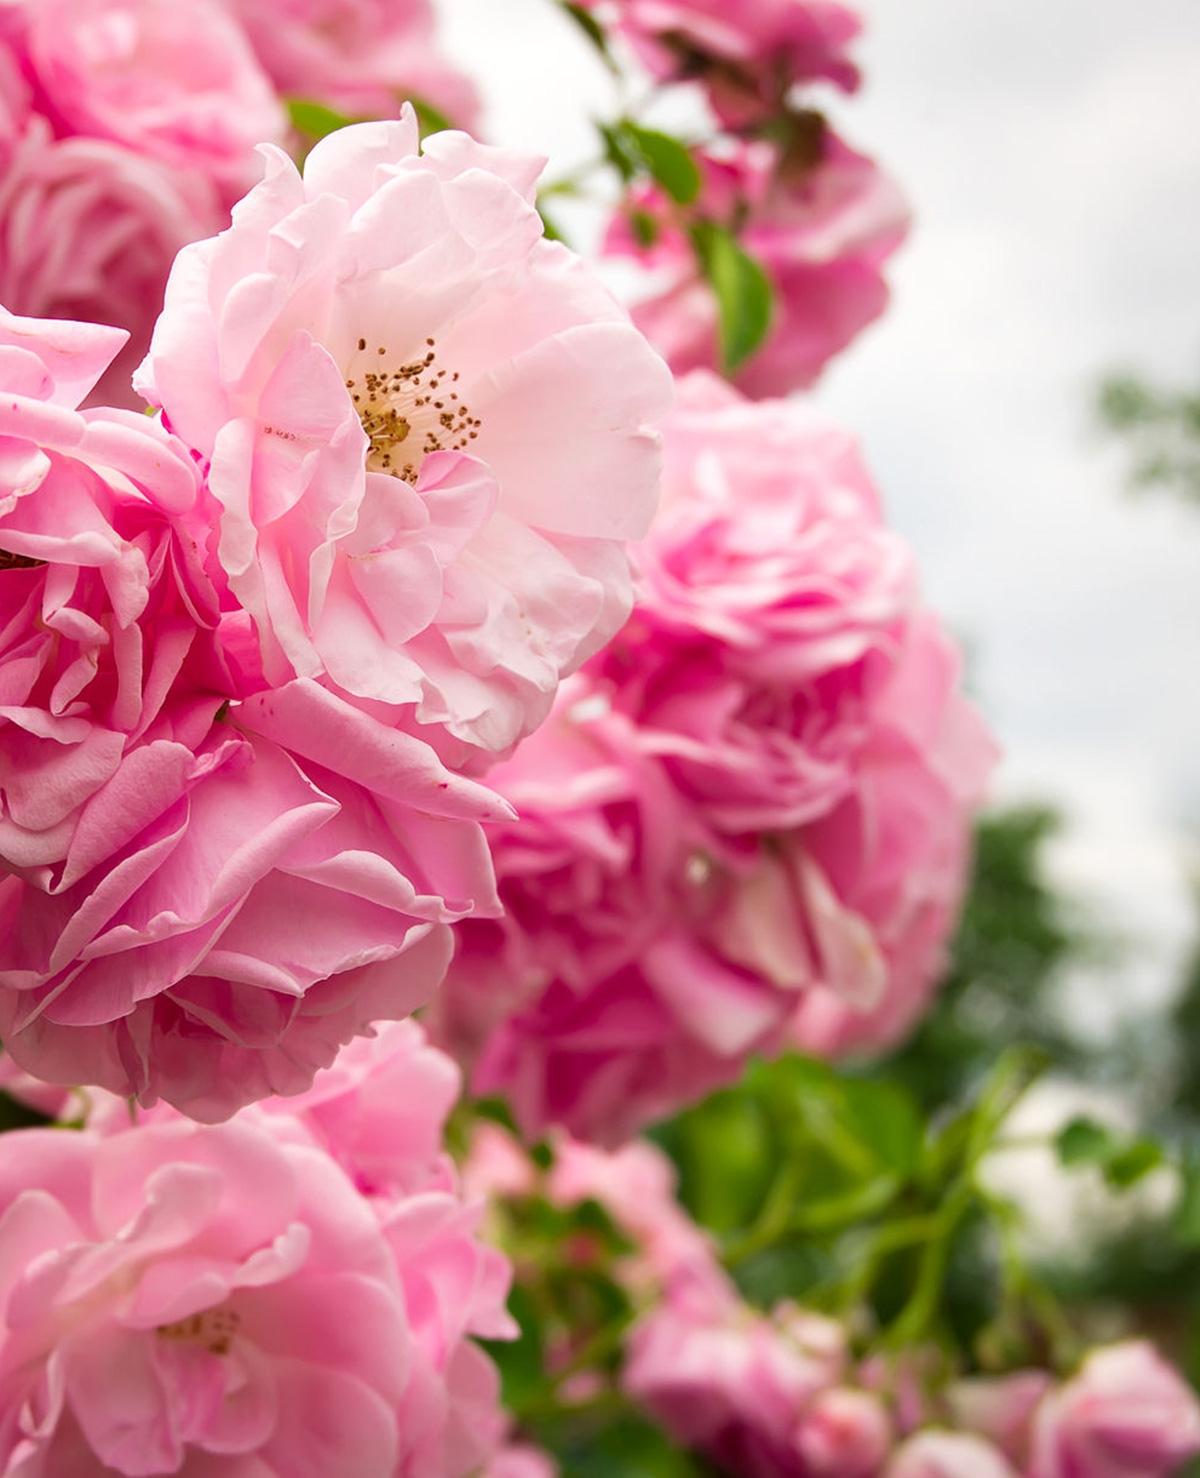 Where the wild roses grow – Maan & Ivan Peroti